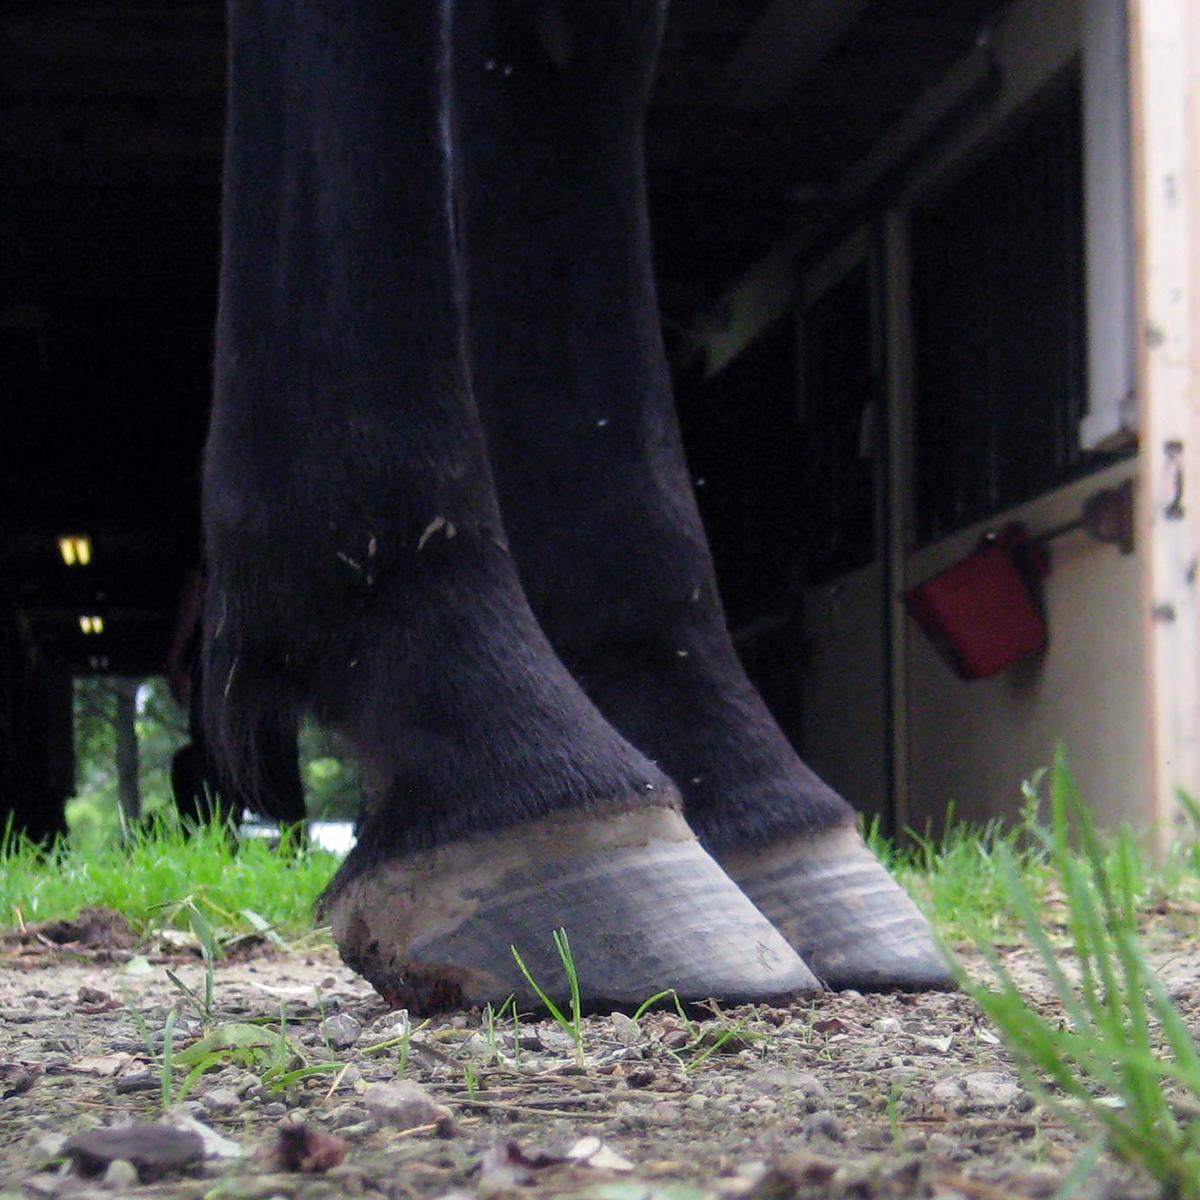 Mustang Hooves